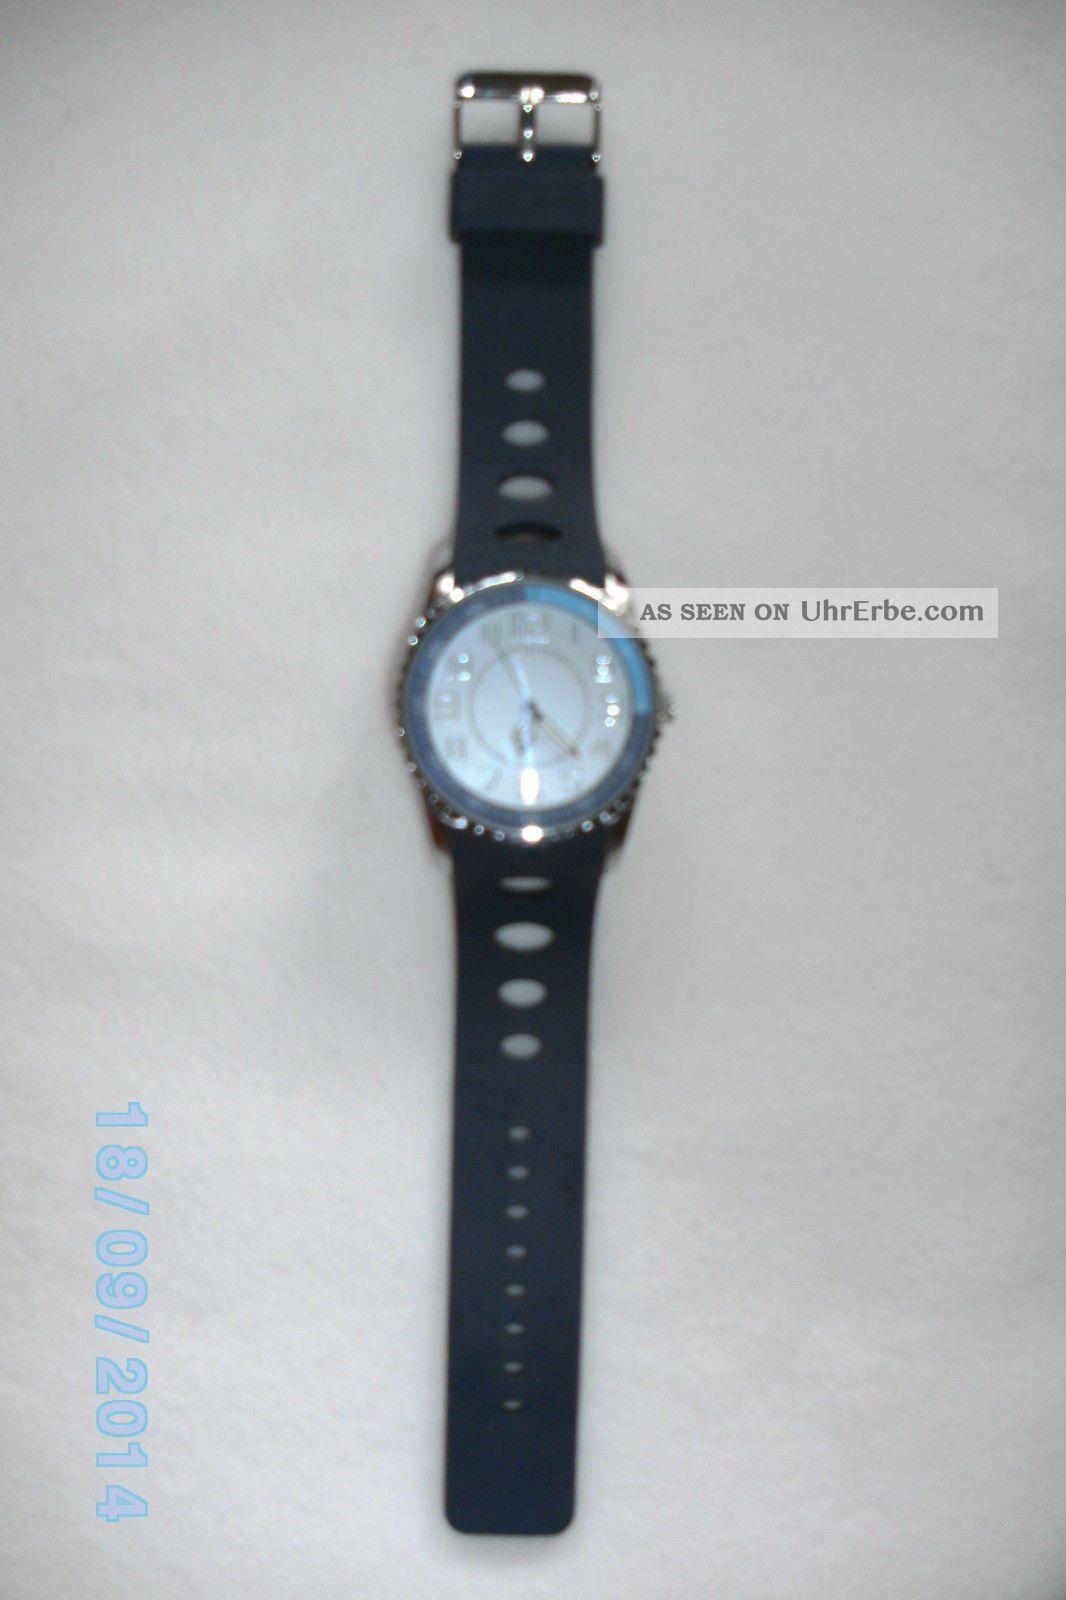 Herren Armbanduhr Uhr Herrenuhr Blau Siliconband 1/4 Ring Ist Hellblau Look Armbanduhren Bild